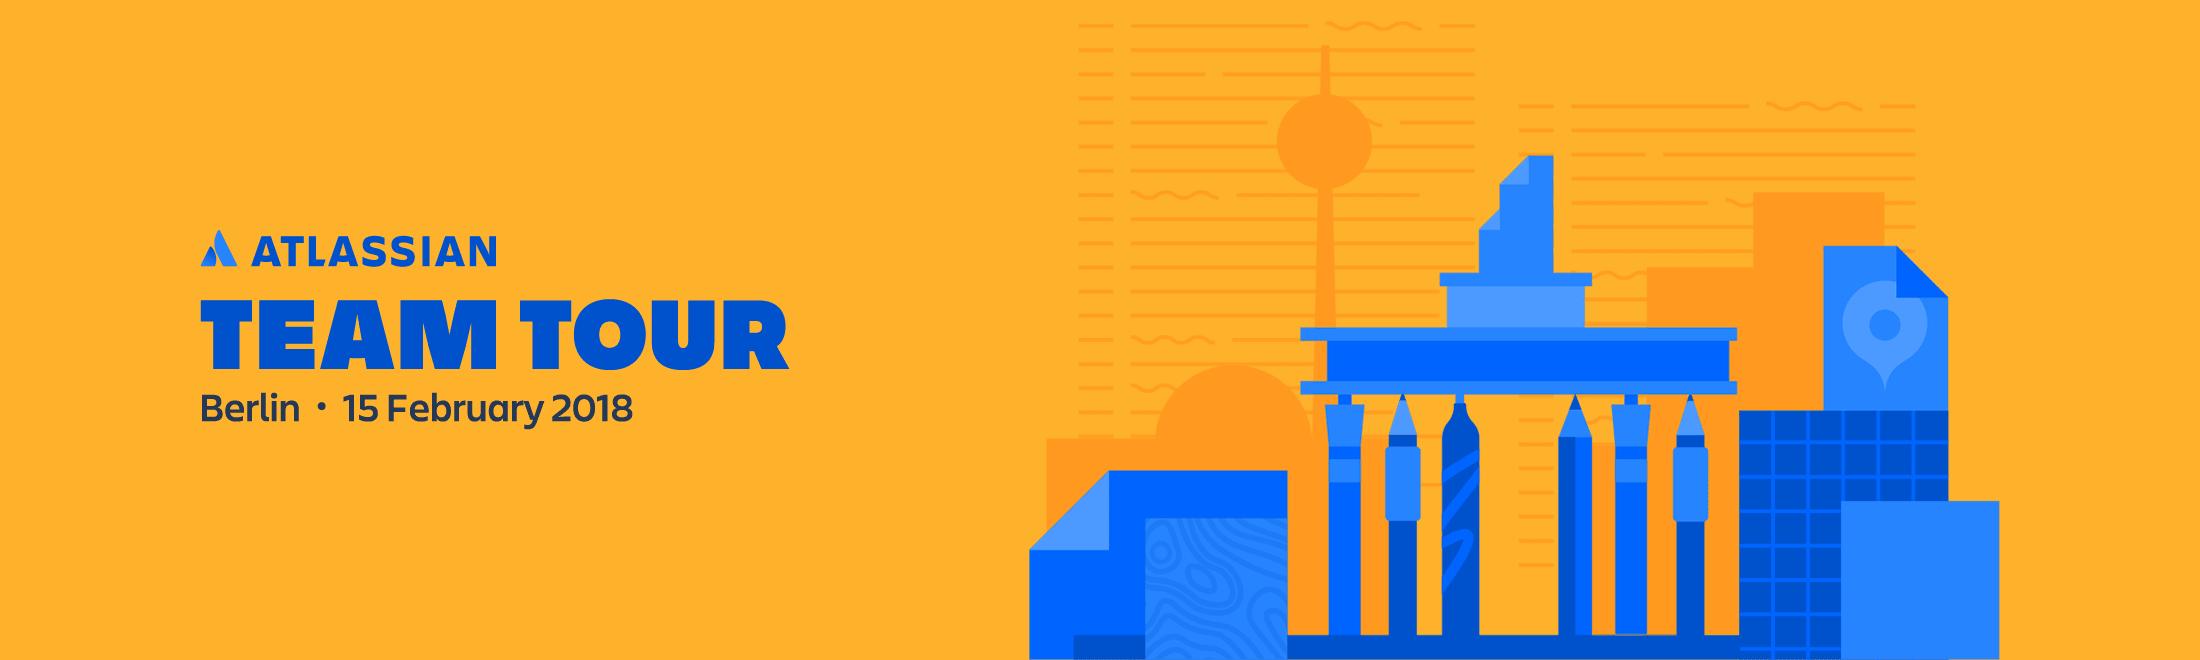 draw.io加入Atlassian团队之旅